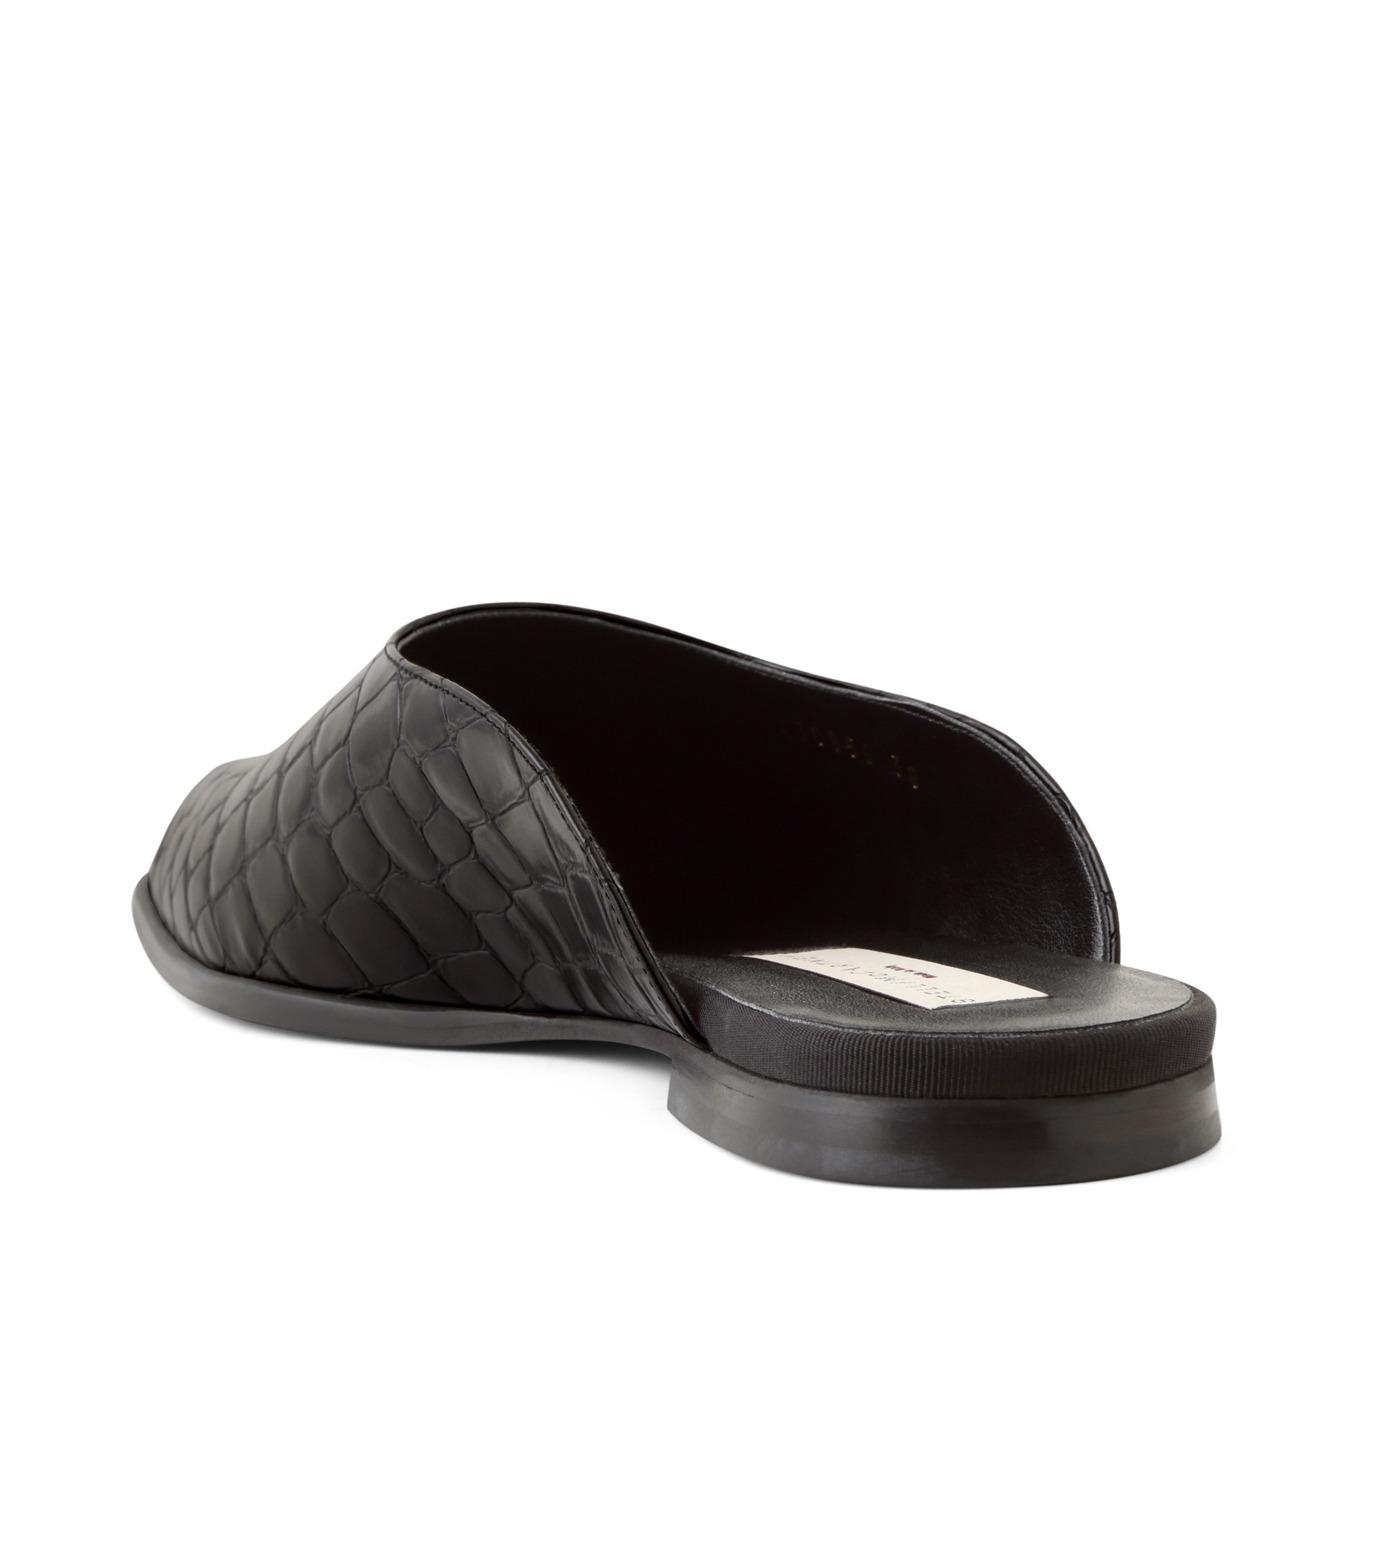 Stella McCartney(ステラマッカートニー)のCroco Moccasion-BLACK(フラットシューズ/Flat shoes)-430856-W0ZY0-13 拡大詳細画像2